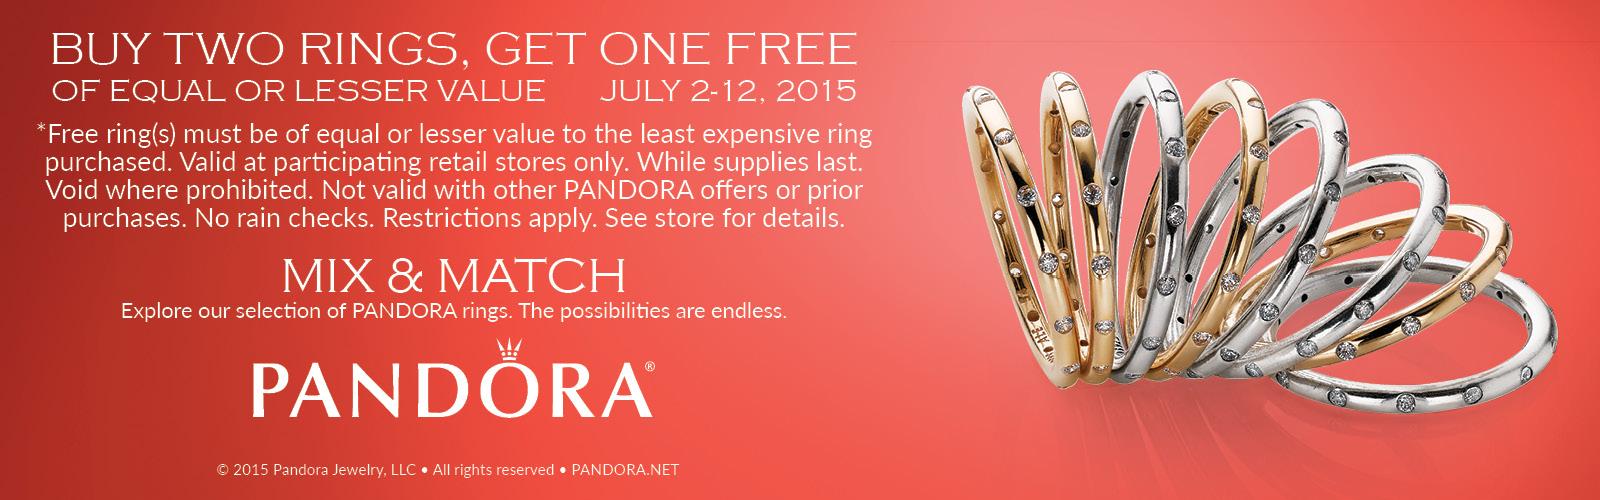 Pandora Summer Ring Event